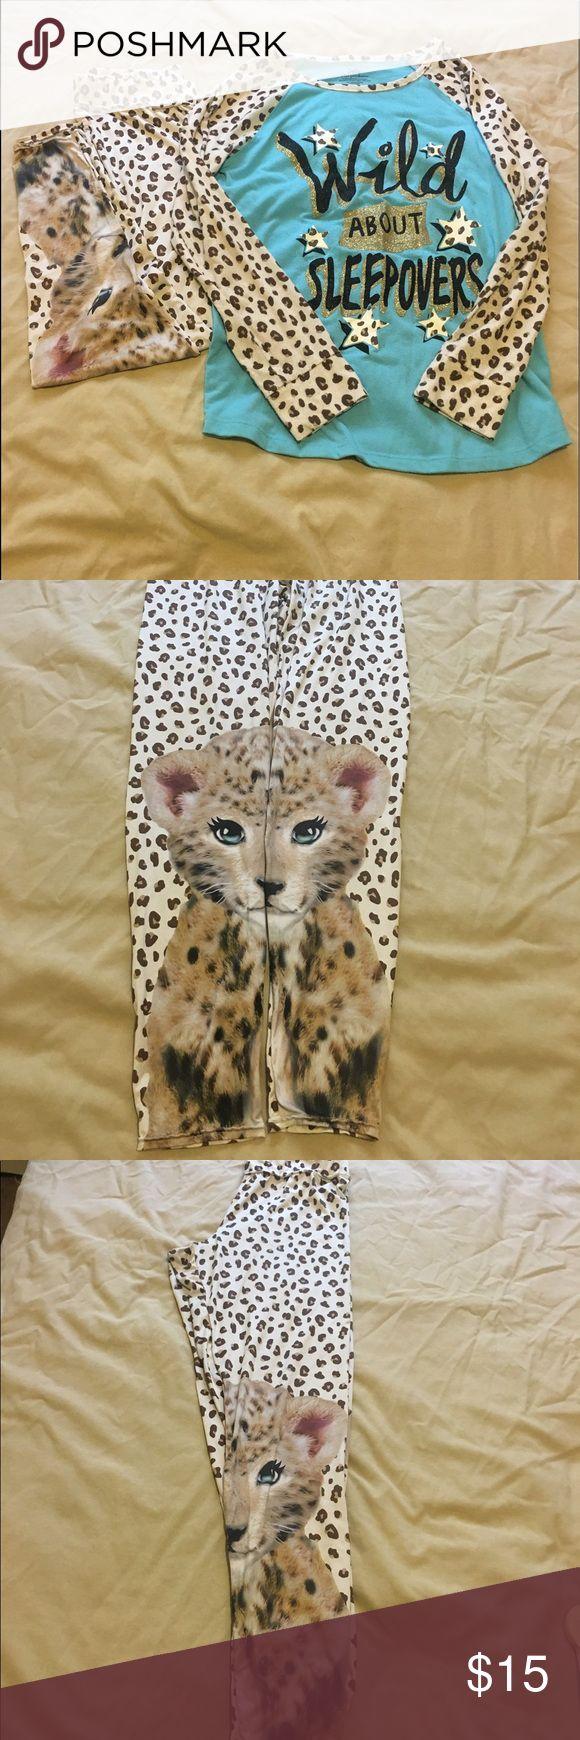 "Girl's Justice Cheetah Print Pajama Set Blue shirt w/ cheetah print sleeves. Cheetah Print joggers cheetah graphic on lower legs. Polyester ""Wild About Sleepovers"" stars on shirt Long sleeve glitter Justice Pajamas Pajama Sets"